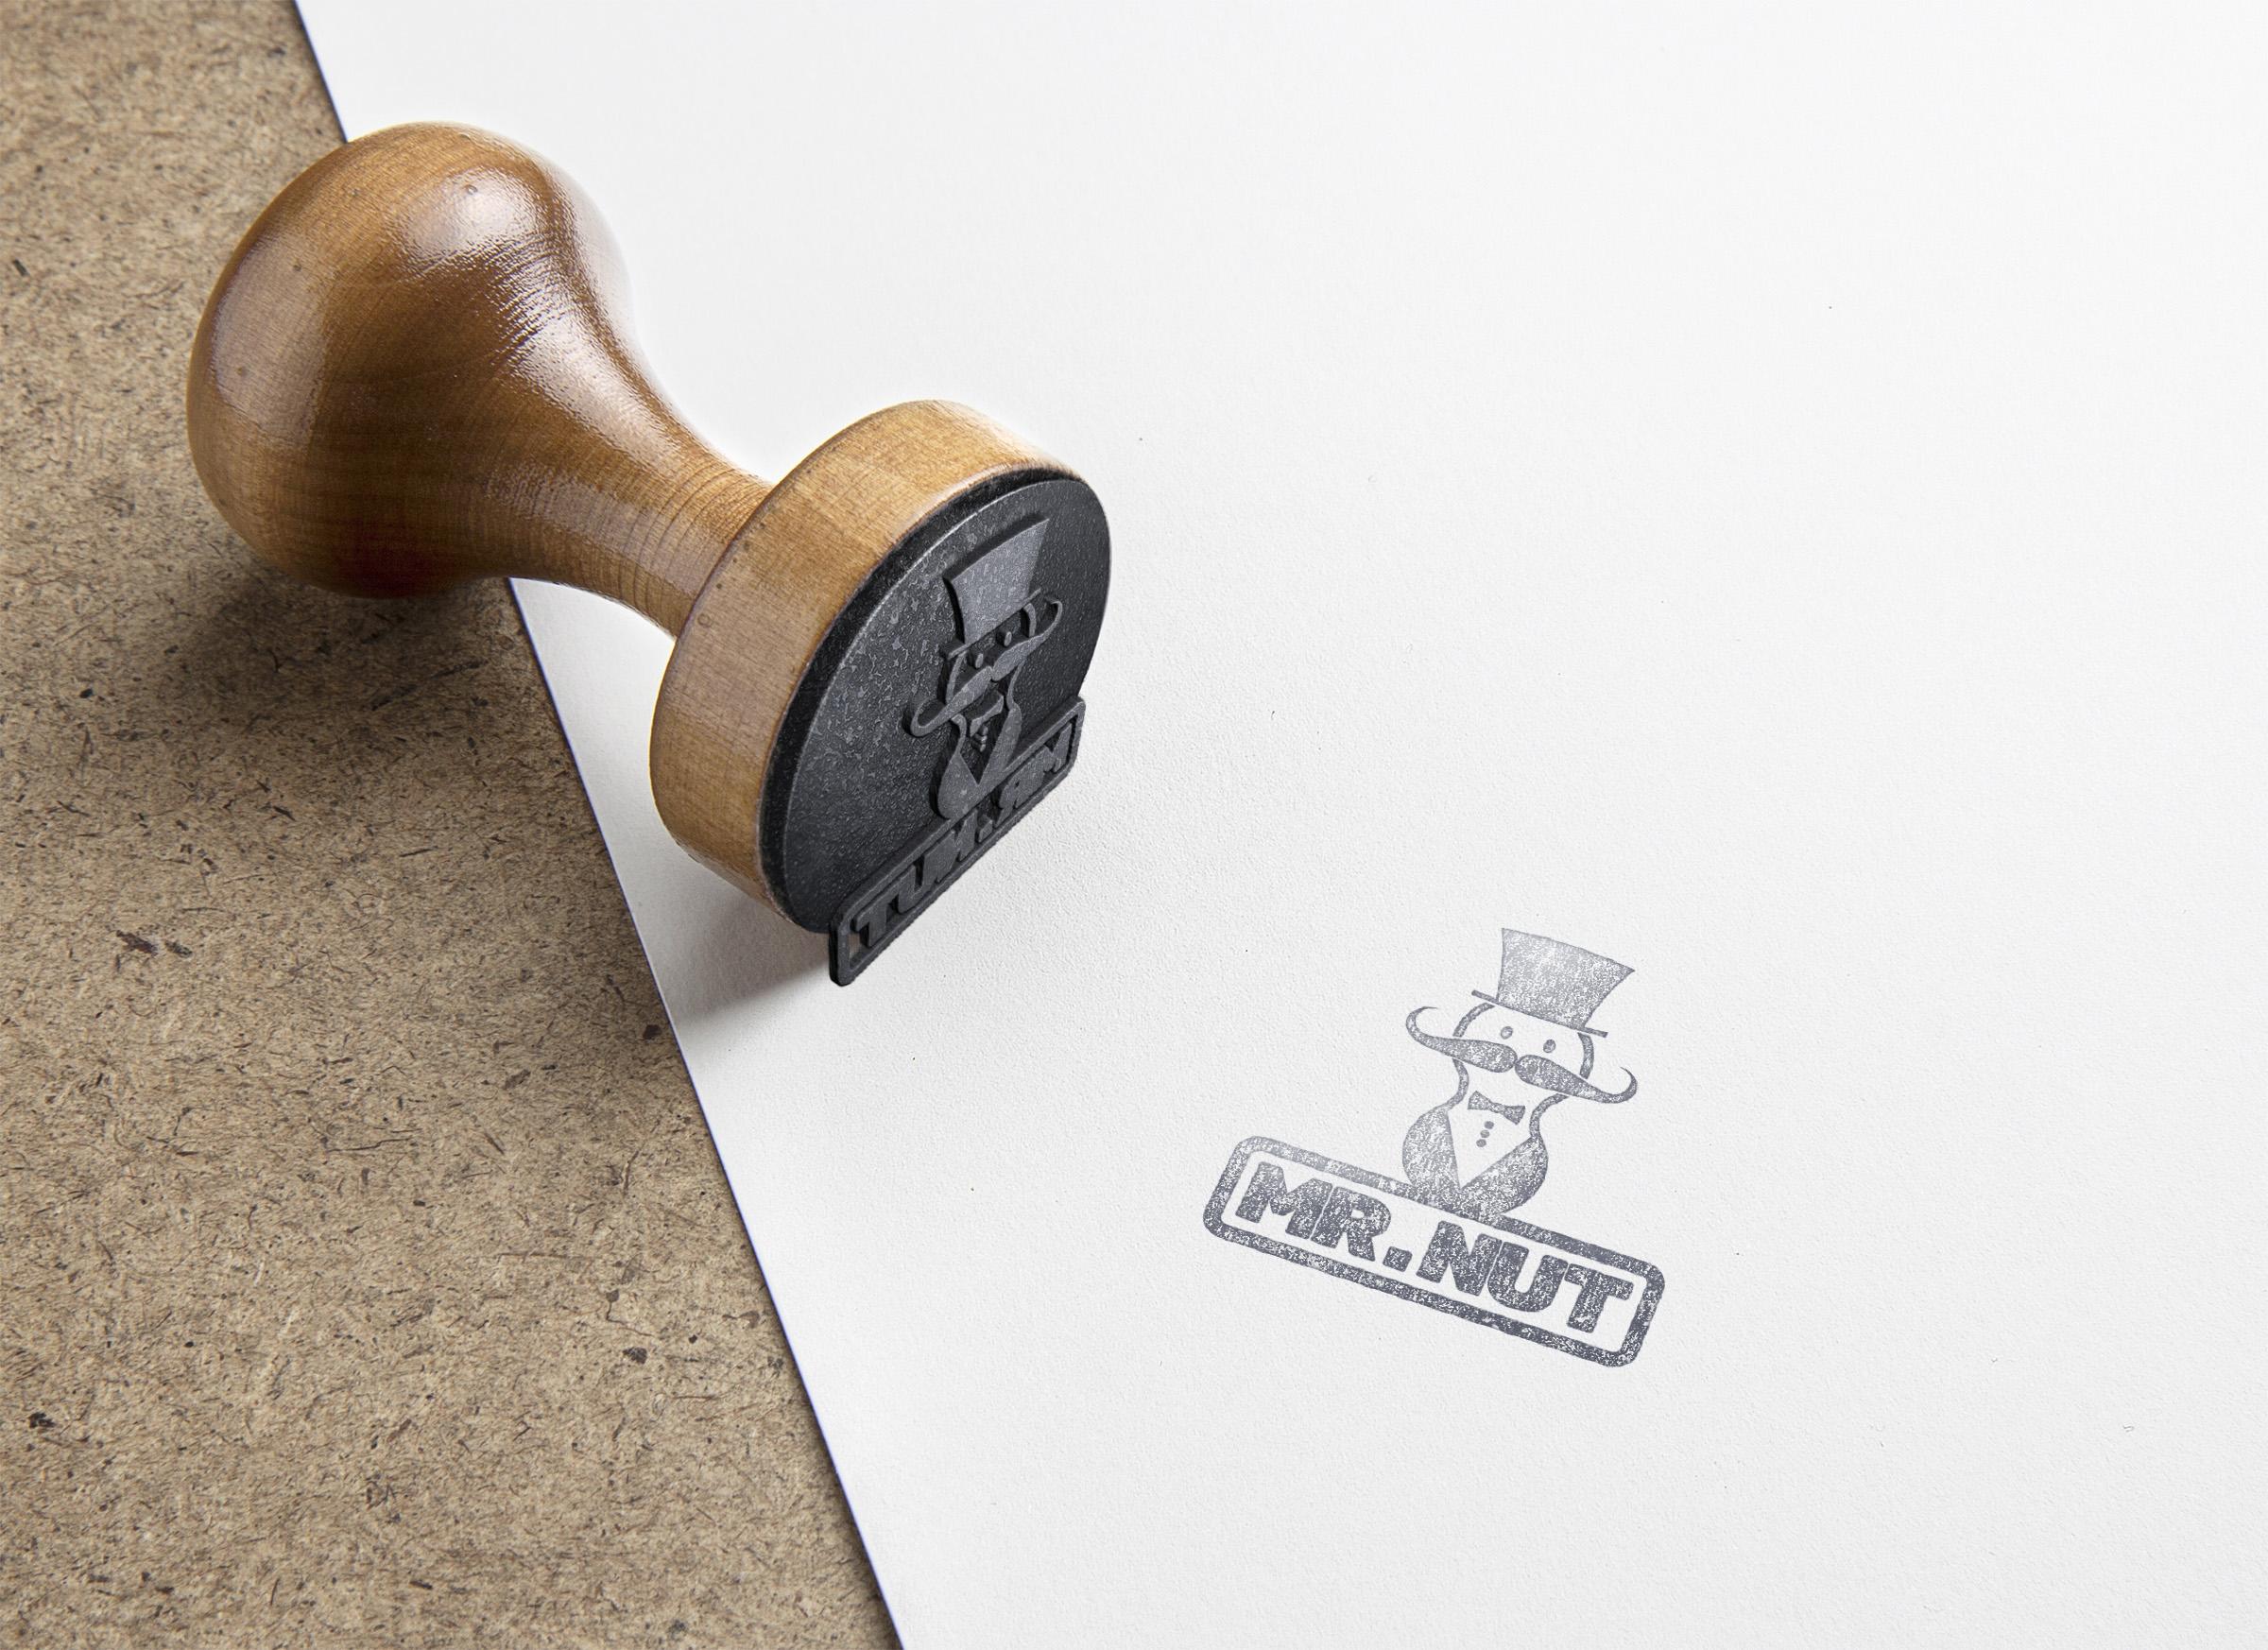 Разработать логотип и визитку фото f_84458f66147be4d4.jpg